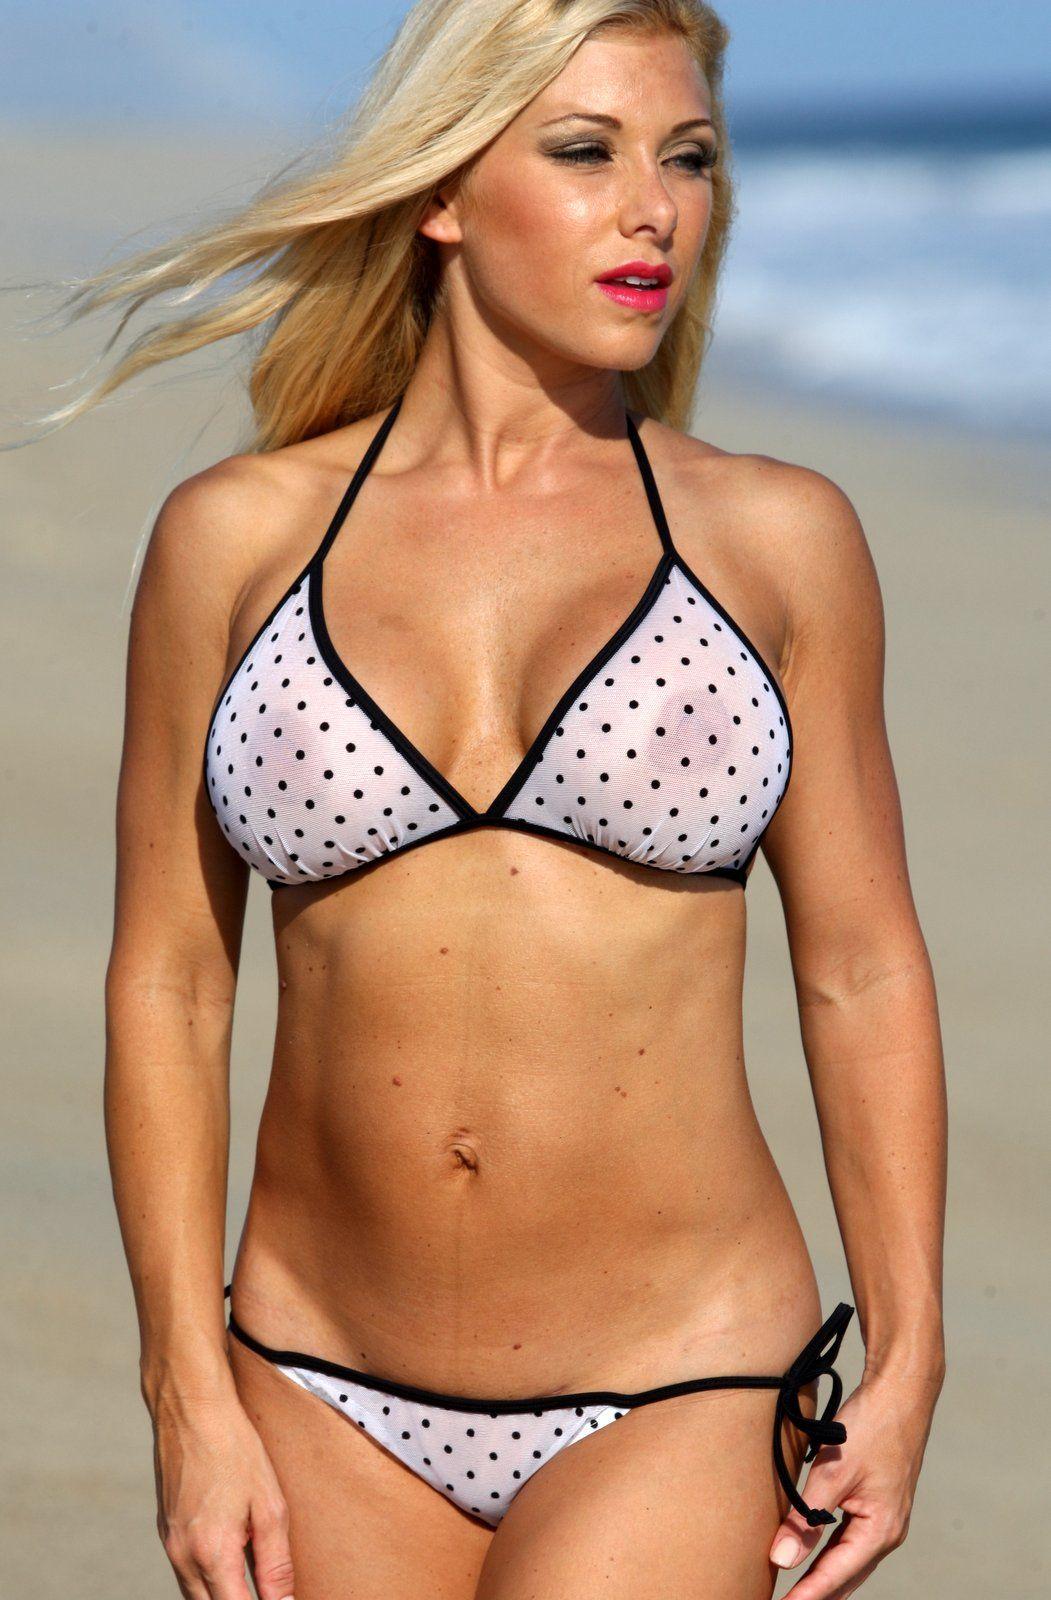 f27dff3a6eb87 Ujena Sheer Saint-Tropez Bikini in 2019   Clothes and Accessories ...